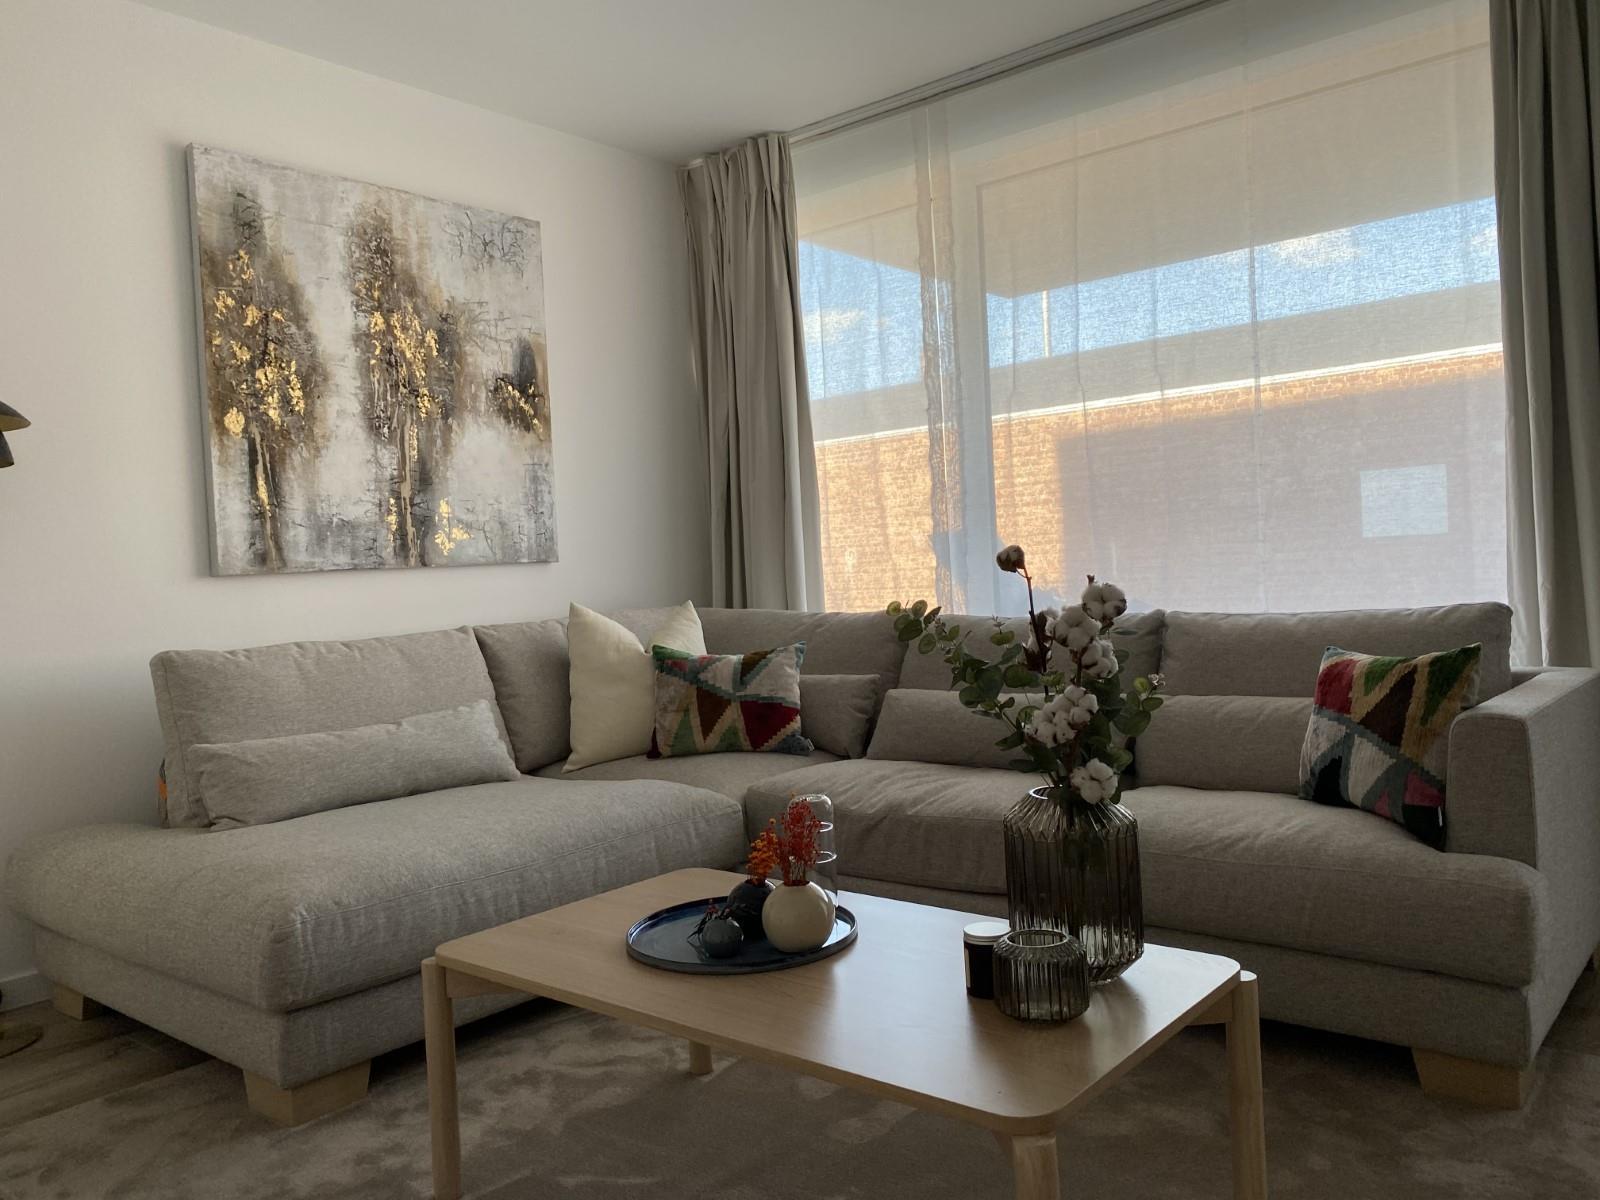 Appartement - Woluwe-Saint-Lambert - #4251247-2